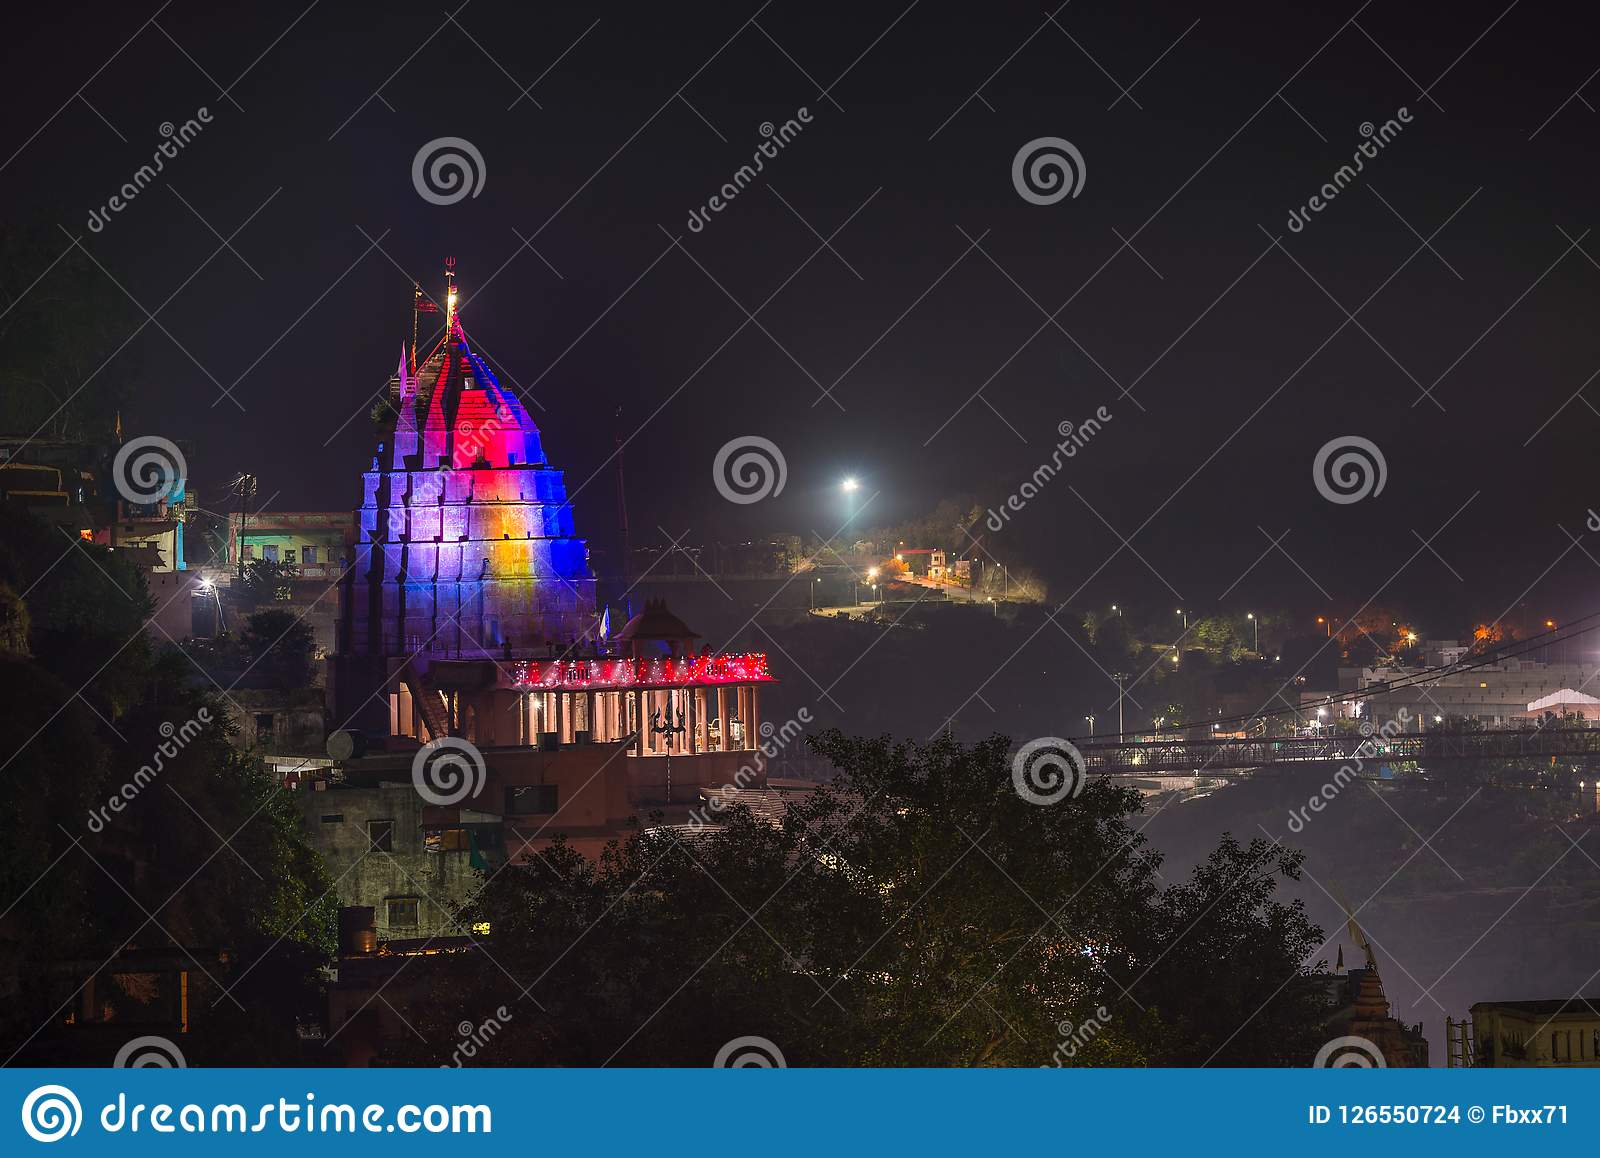 Omkareshwar cityscape by night, India, sacred hindu temple illuminated. Travel destination for tourists and pilgrims